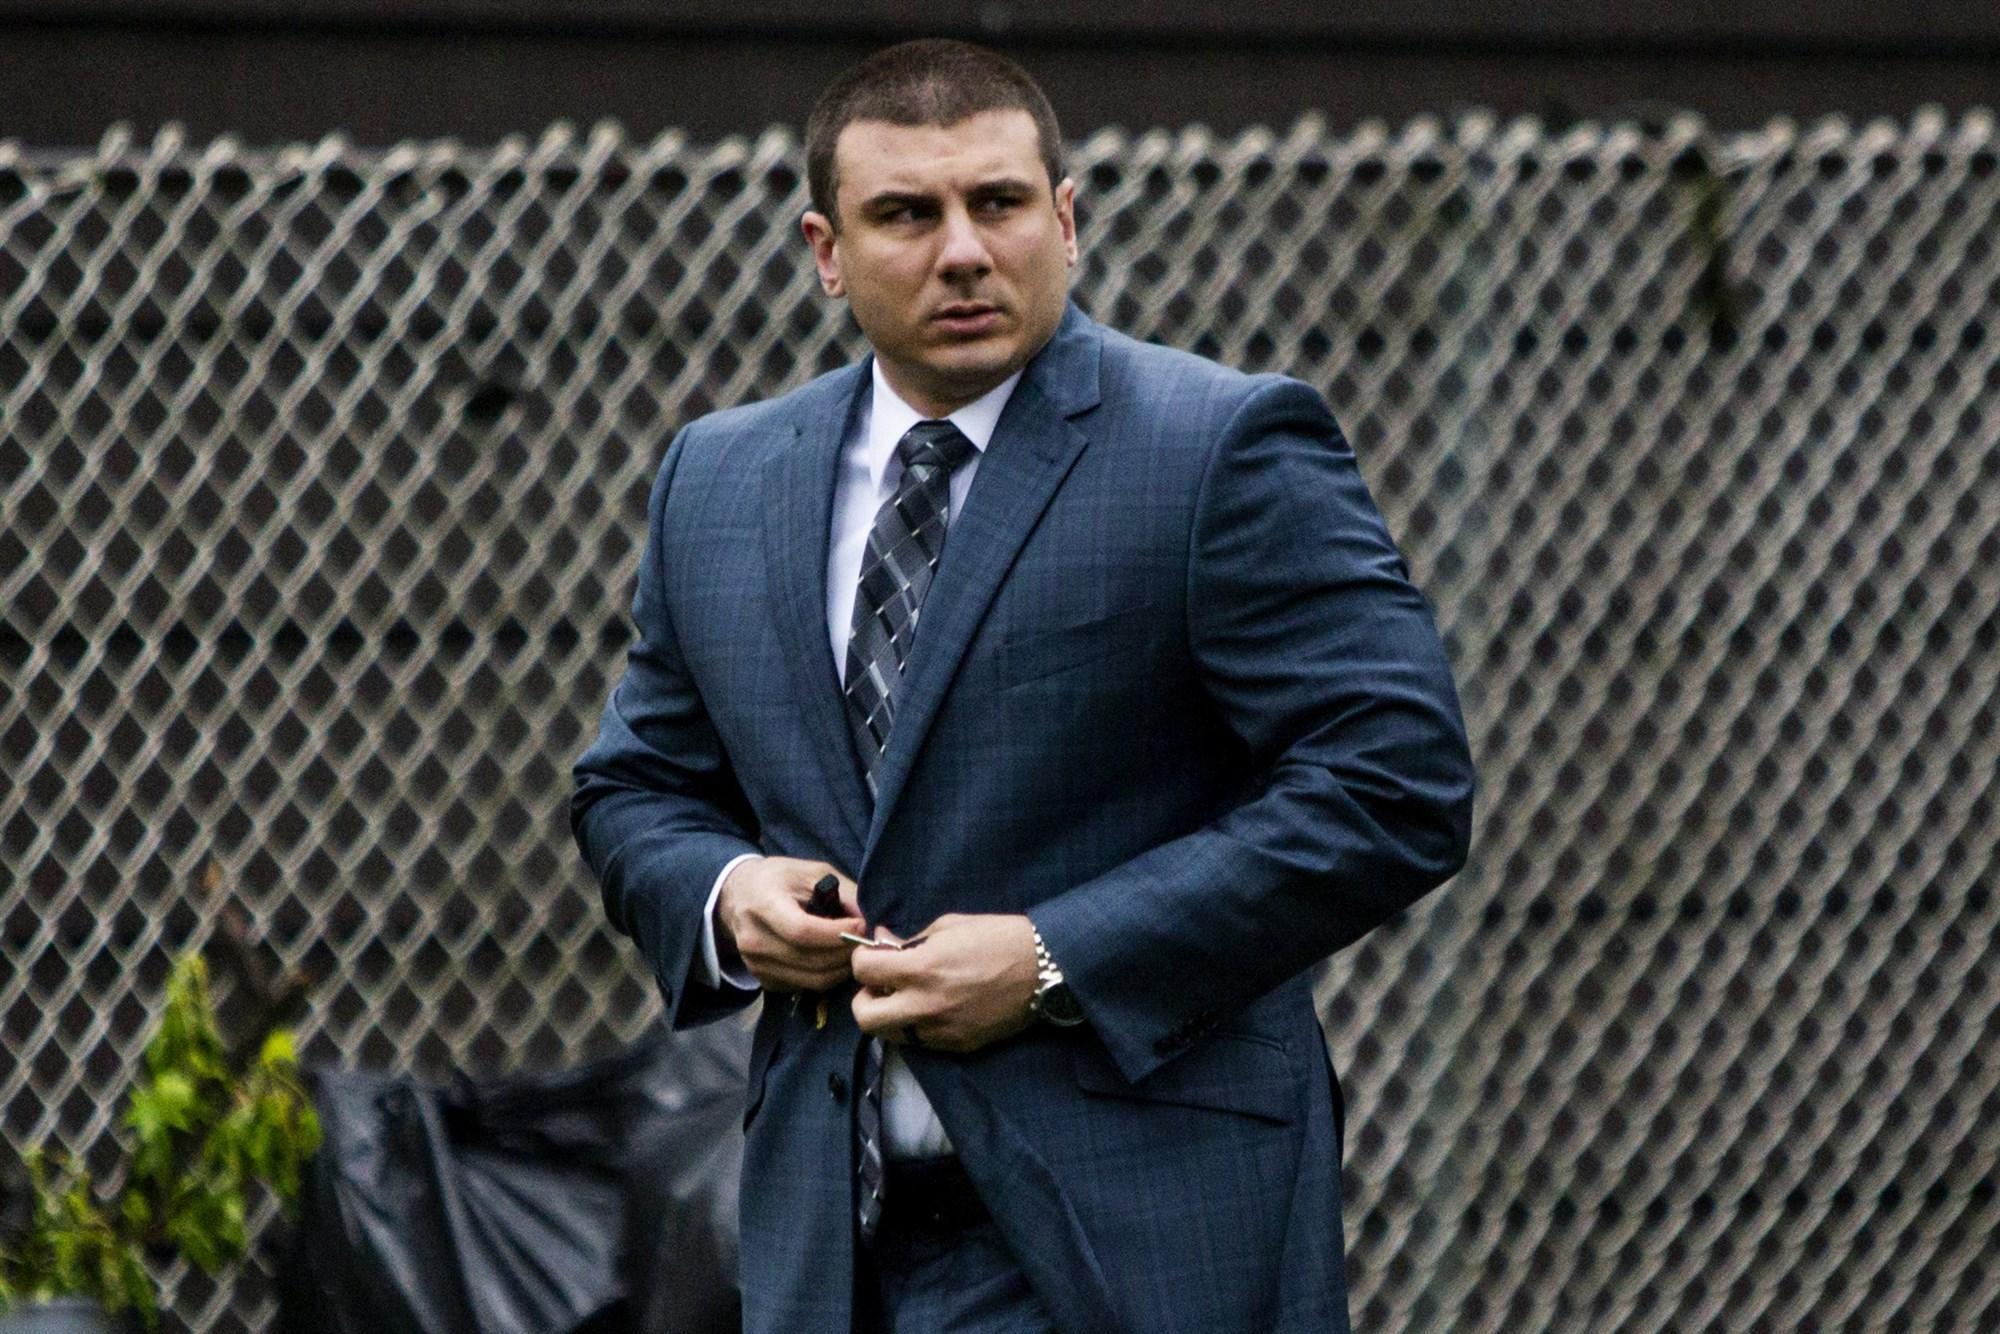 New York City police officer Daniel Pantaleo leaves his house on May 13, 2019, in Staten Island, New York.Eduardo Munoz Alvarez / AP file